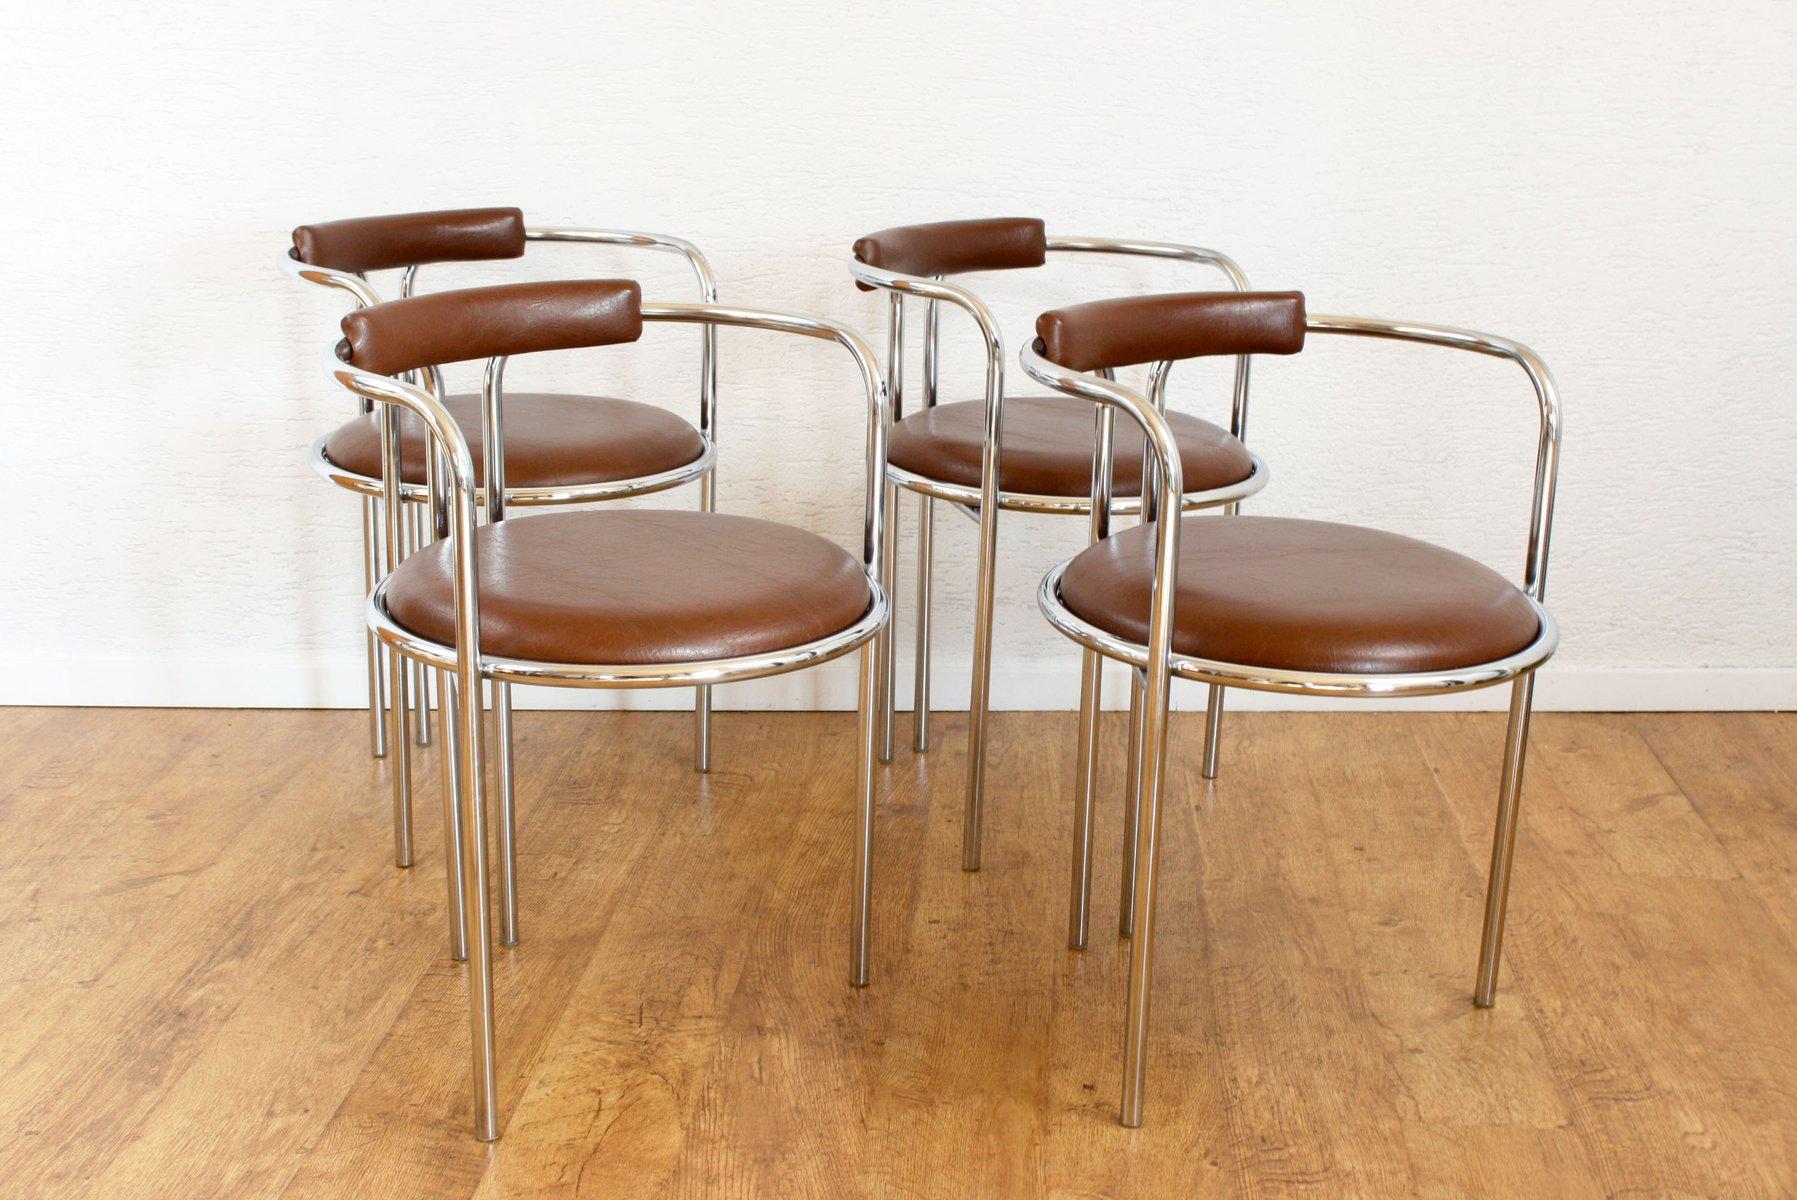 italienische st hle mit braunem kunstlederbezug 4er set bei pamono kaufen. Black Bedroom Furniture Sets. Home Design Ideas